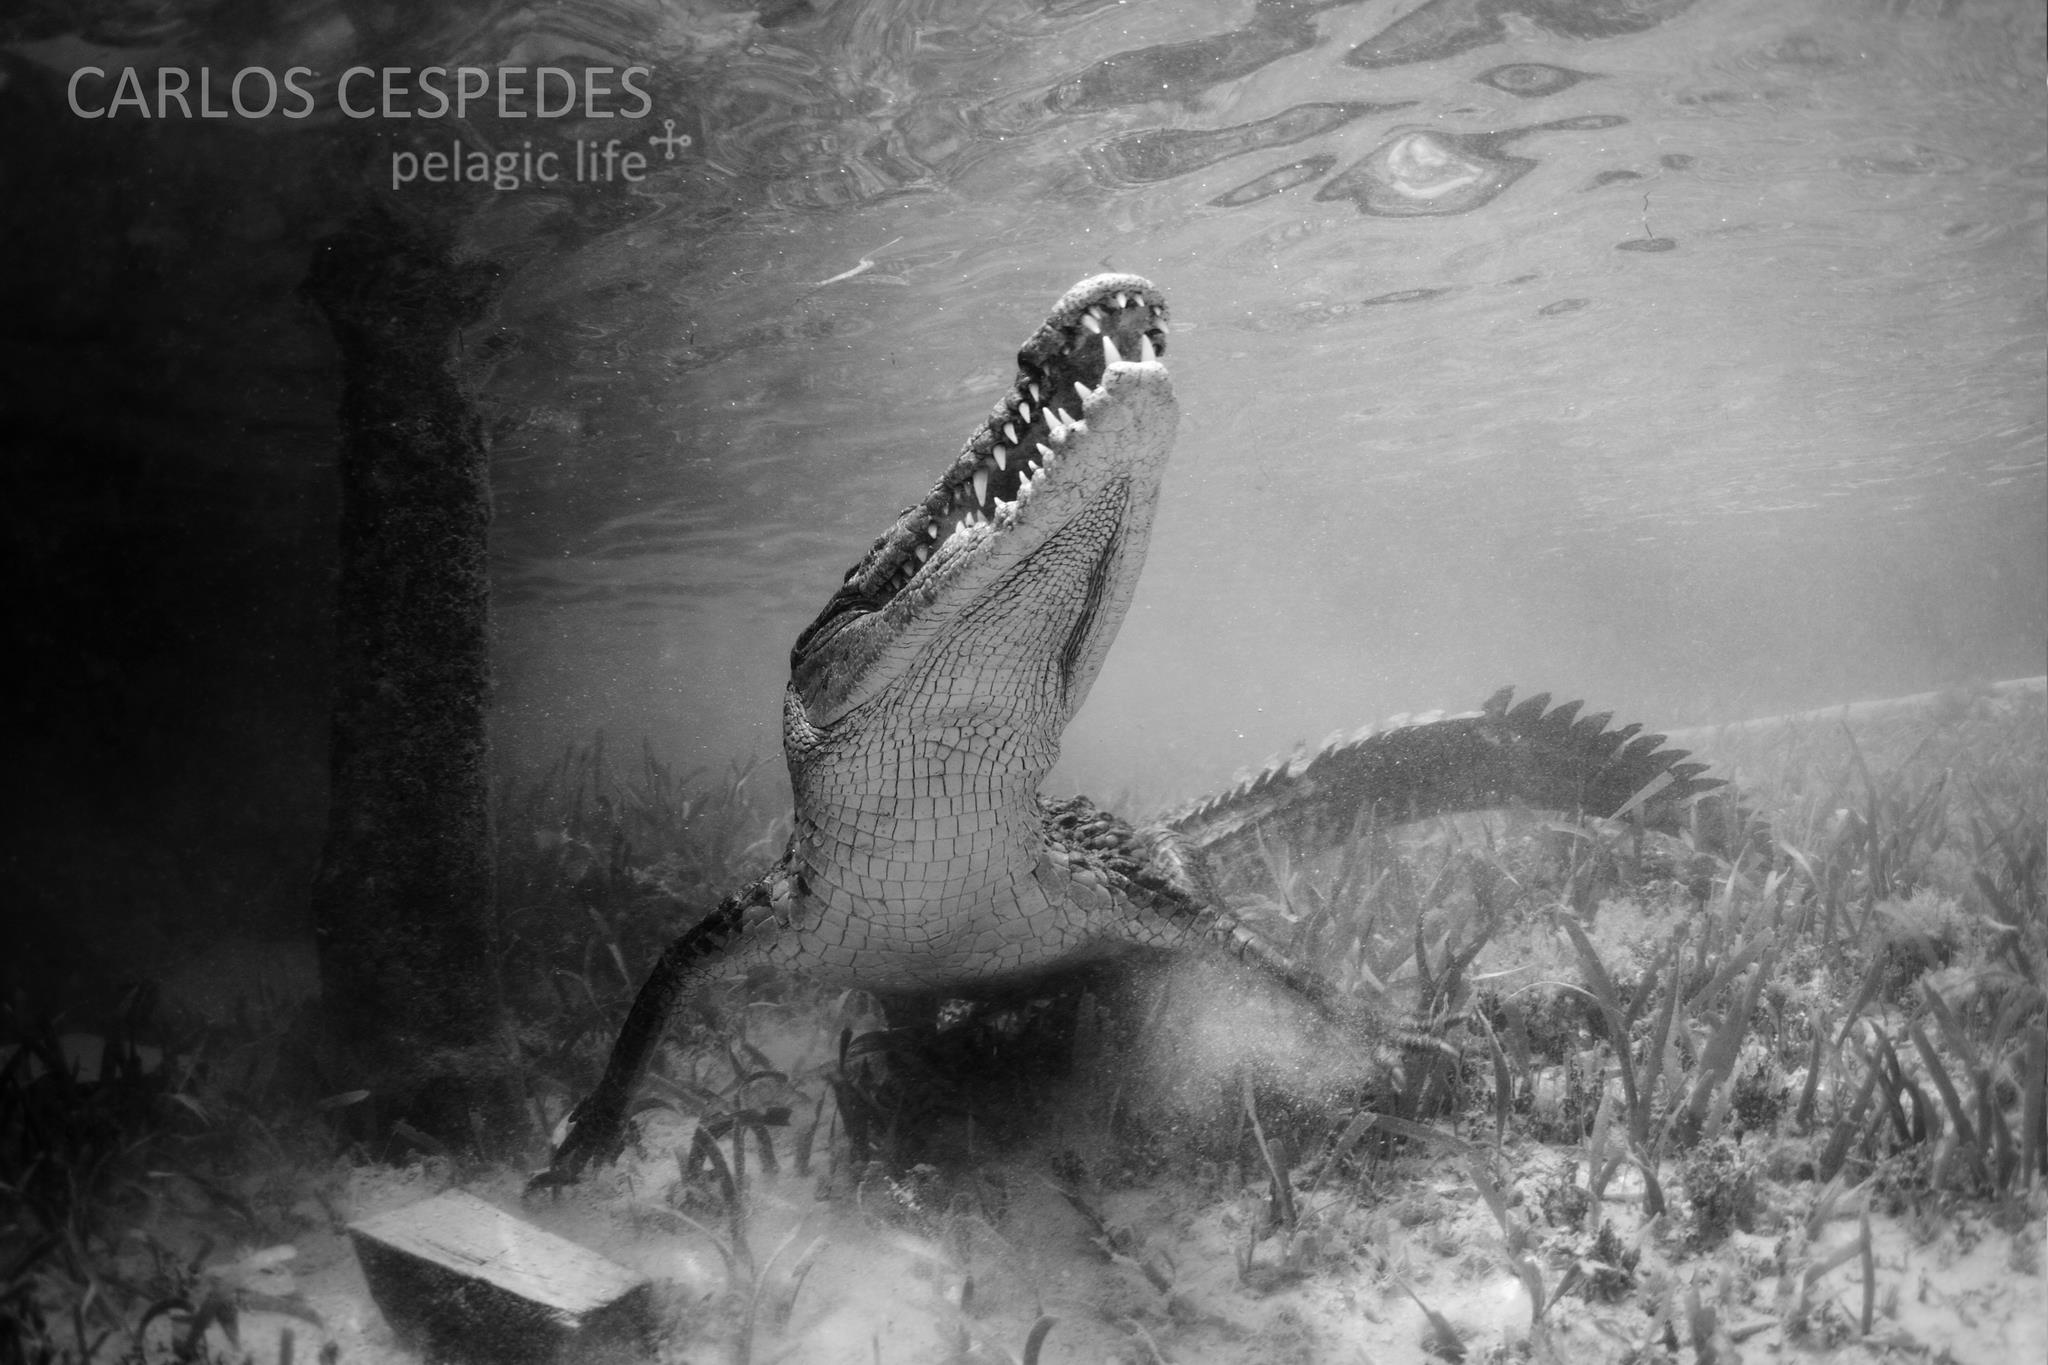 673 -Carribean Dragons-Carlos Cespedes-Chinchorro Xcalak-Marzo 2013.jpg